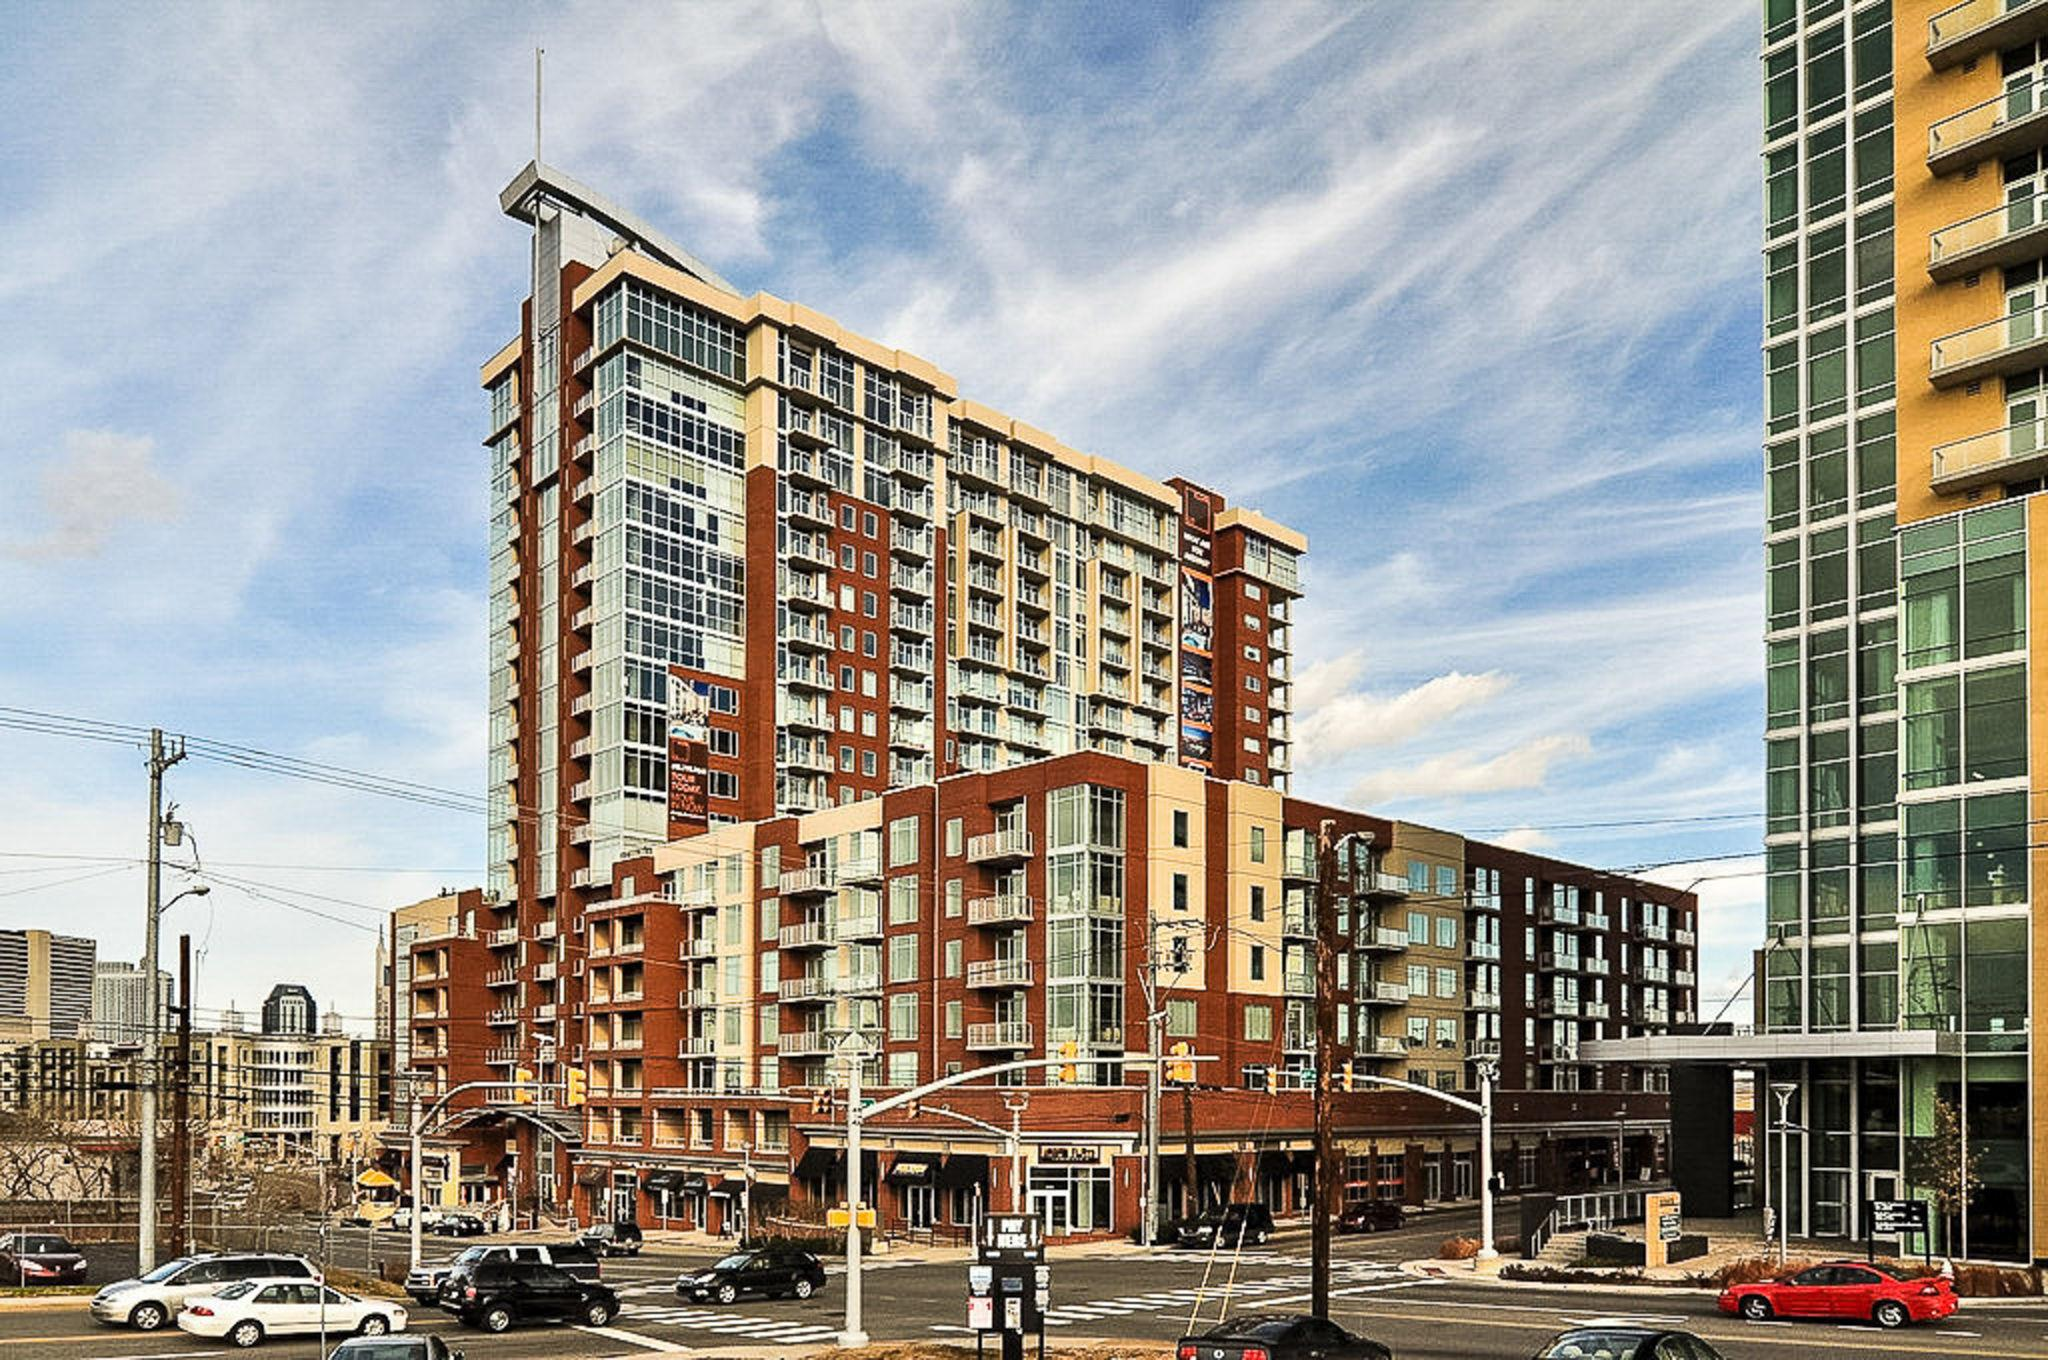 600 12th Ave S Apt 408, Nashville, TN 37203 - Nashville, TN real estate listing